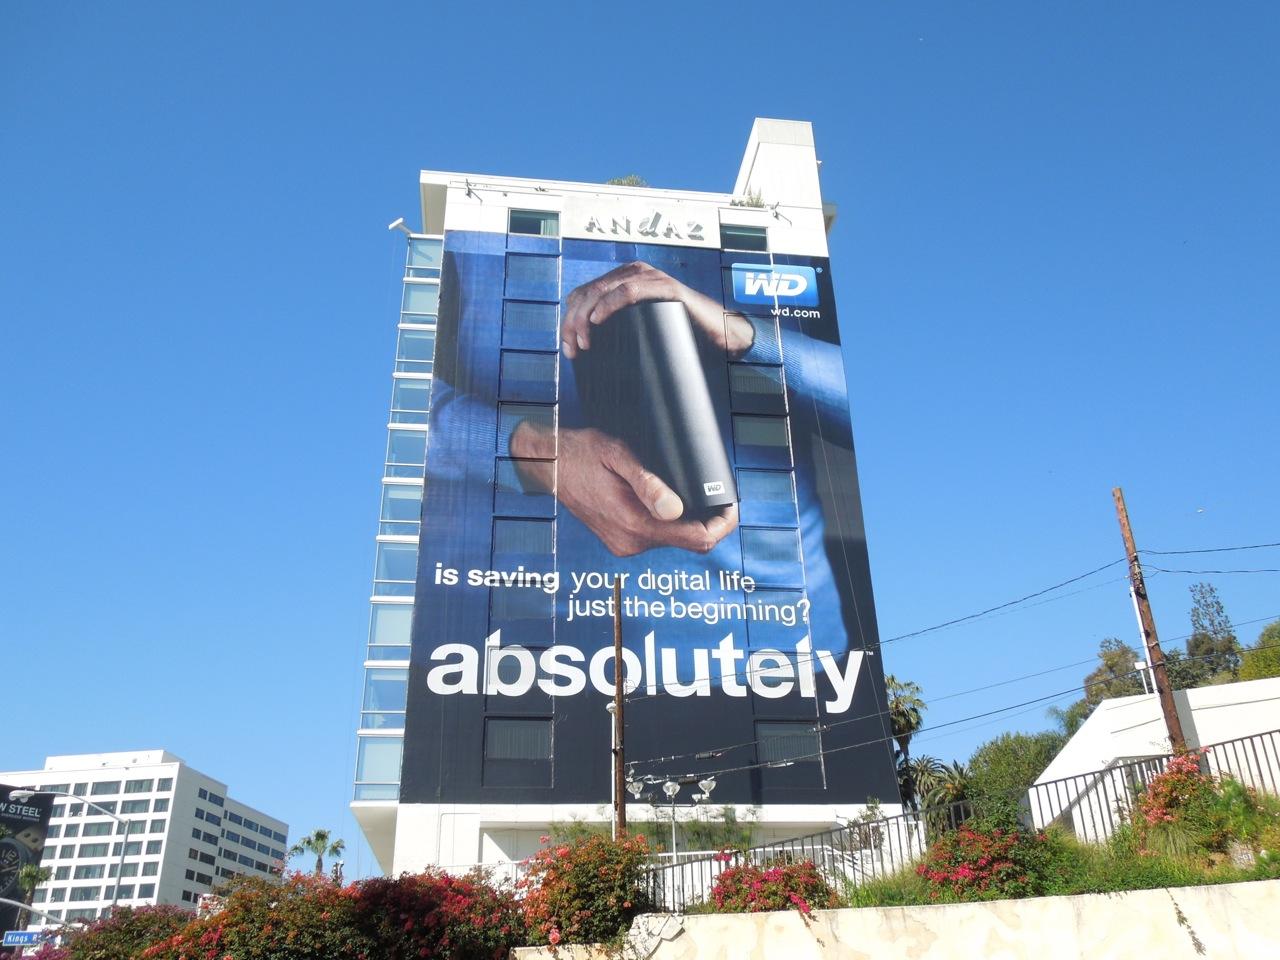 Real Estate Billboard Design Samples - Giant wd absolutely billboard andaz hotel